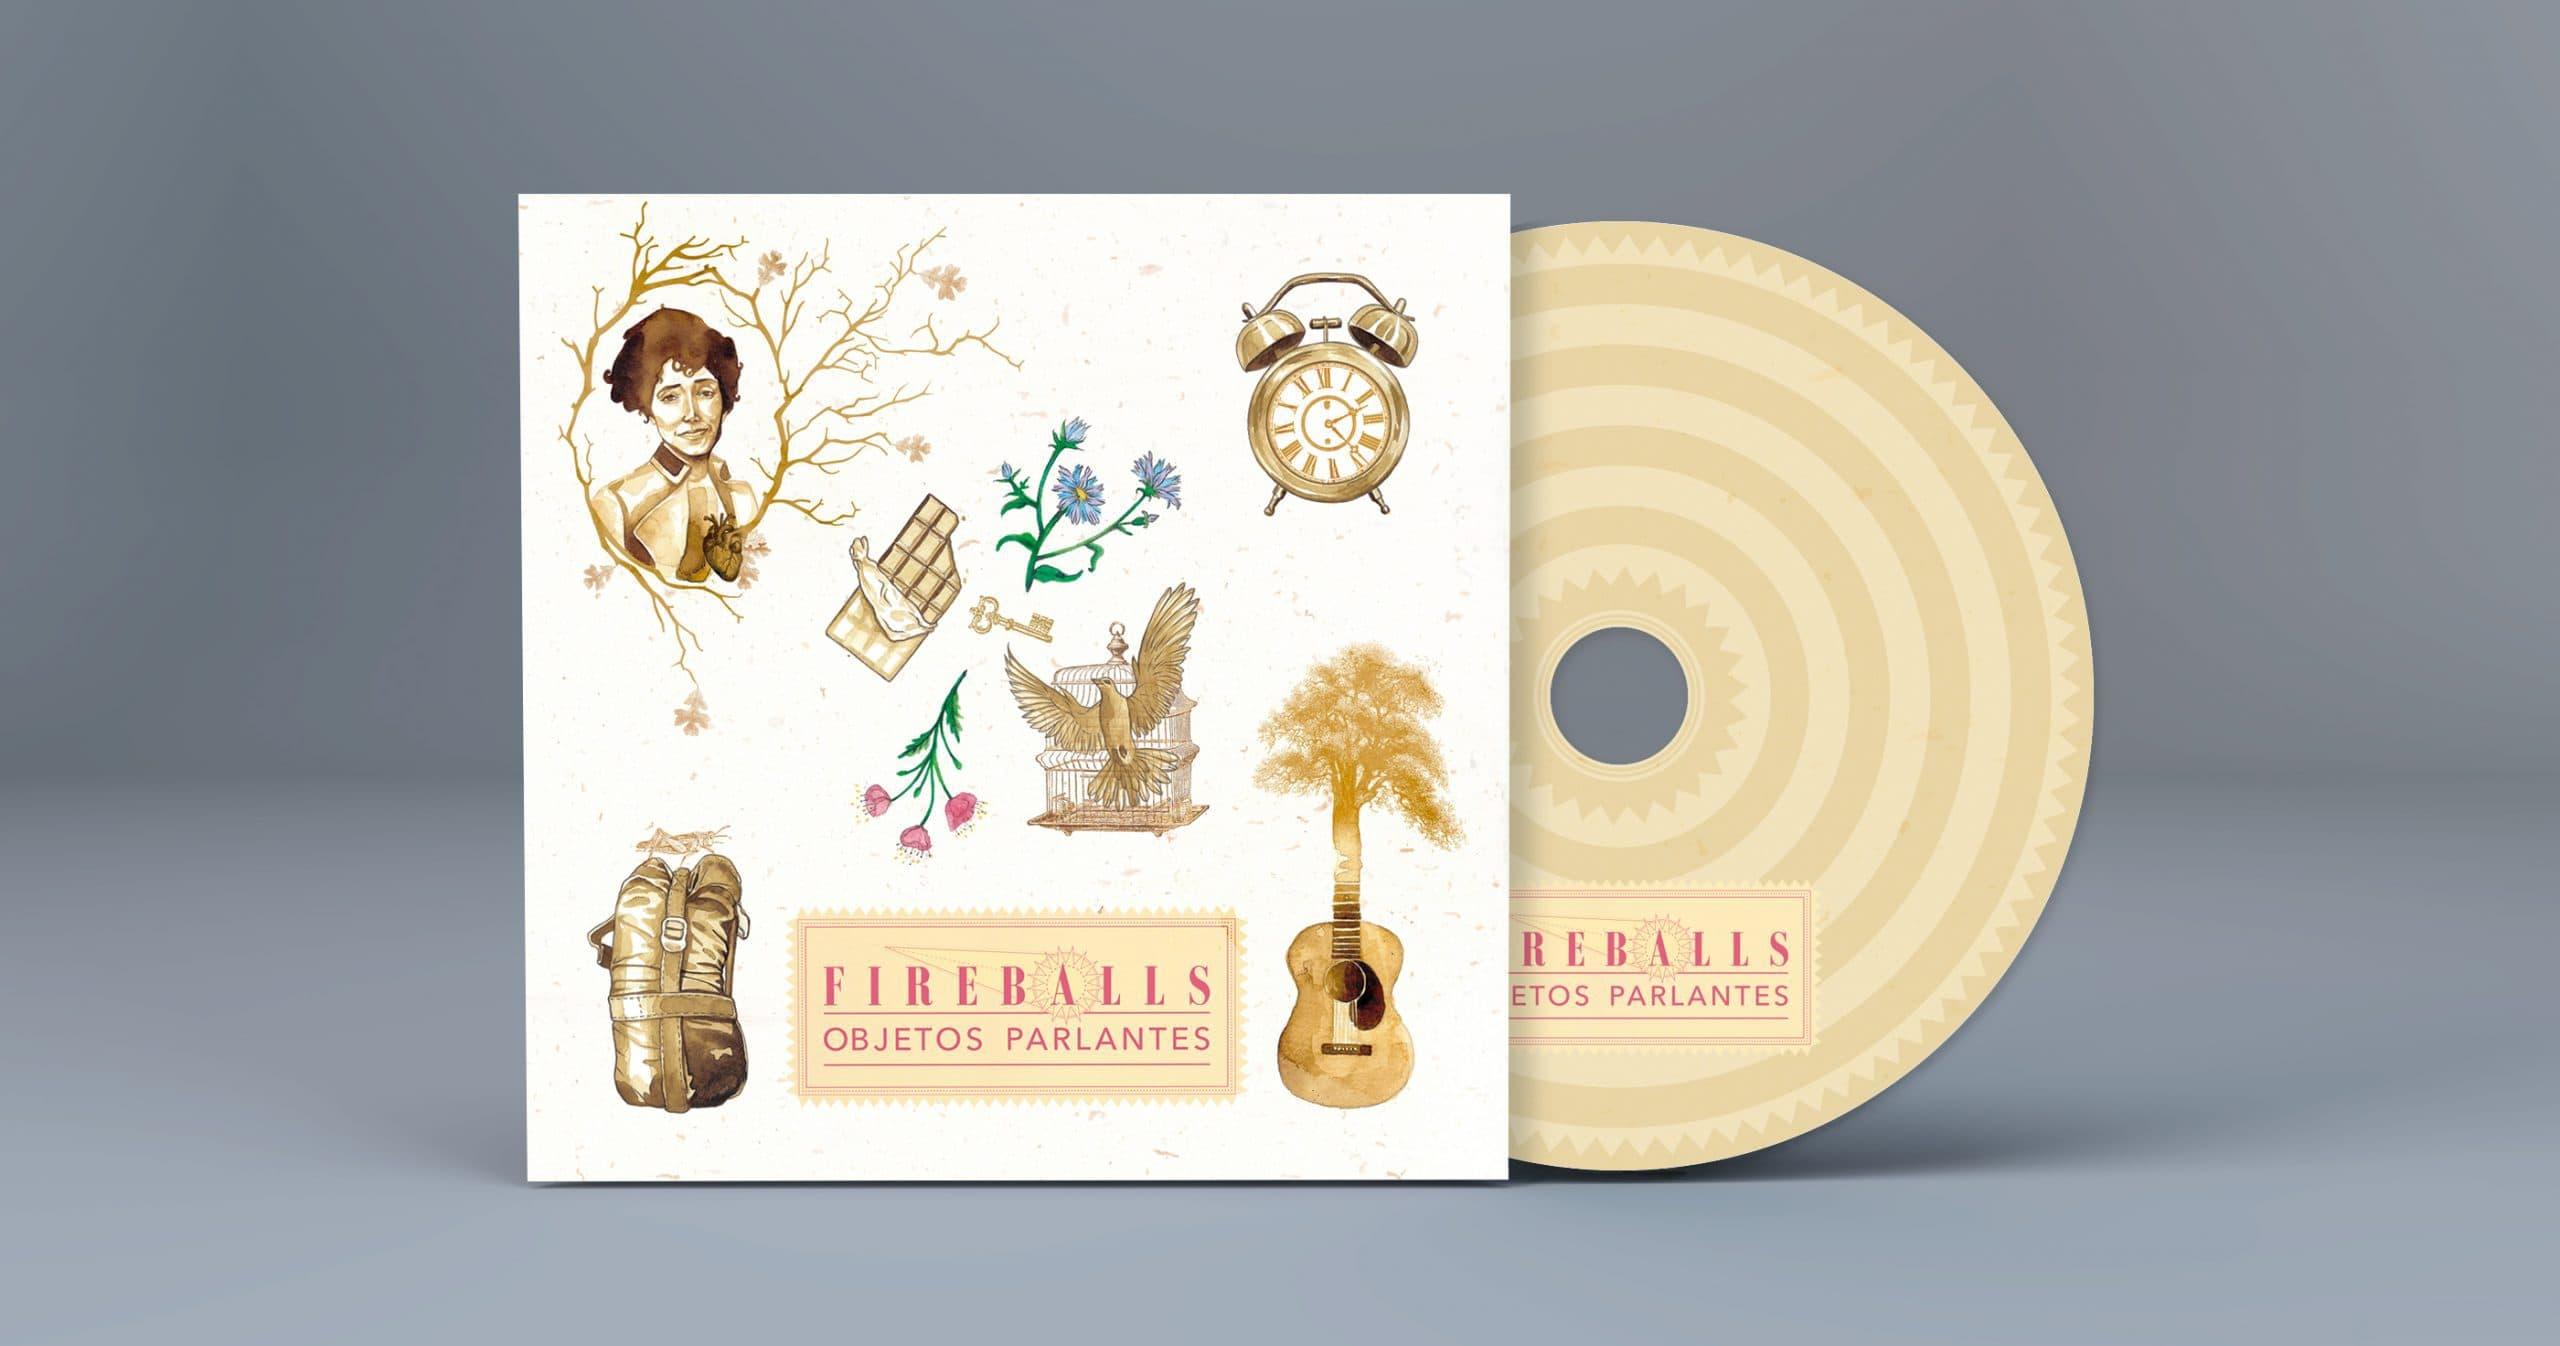 Fireballs Objetos Parlantes Alejandro Ouro